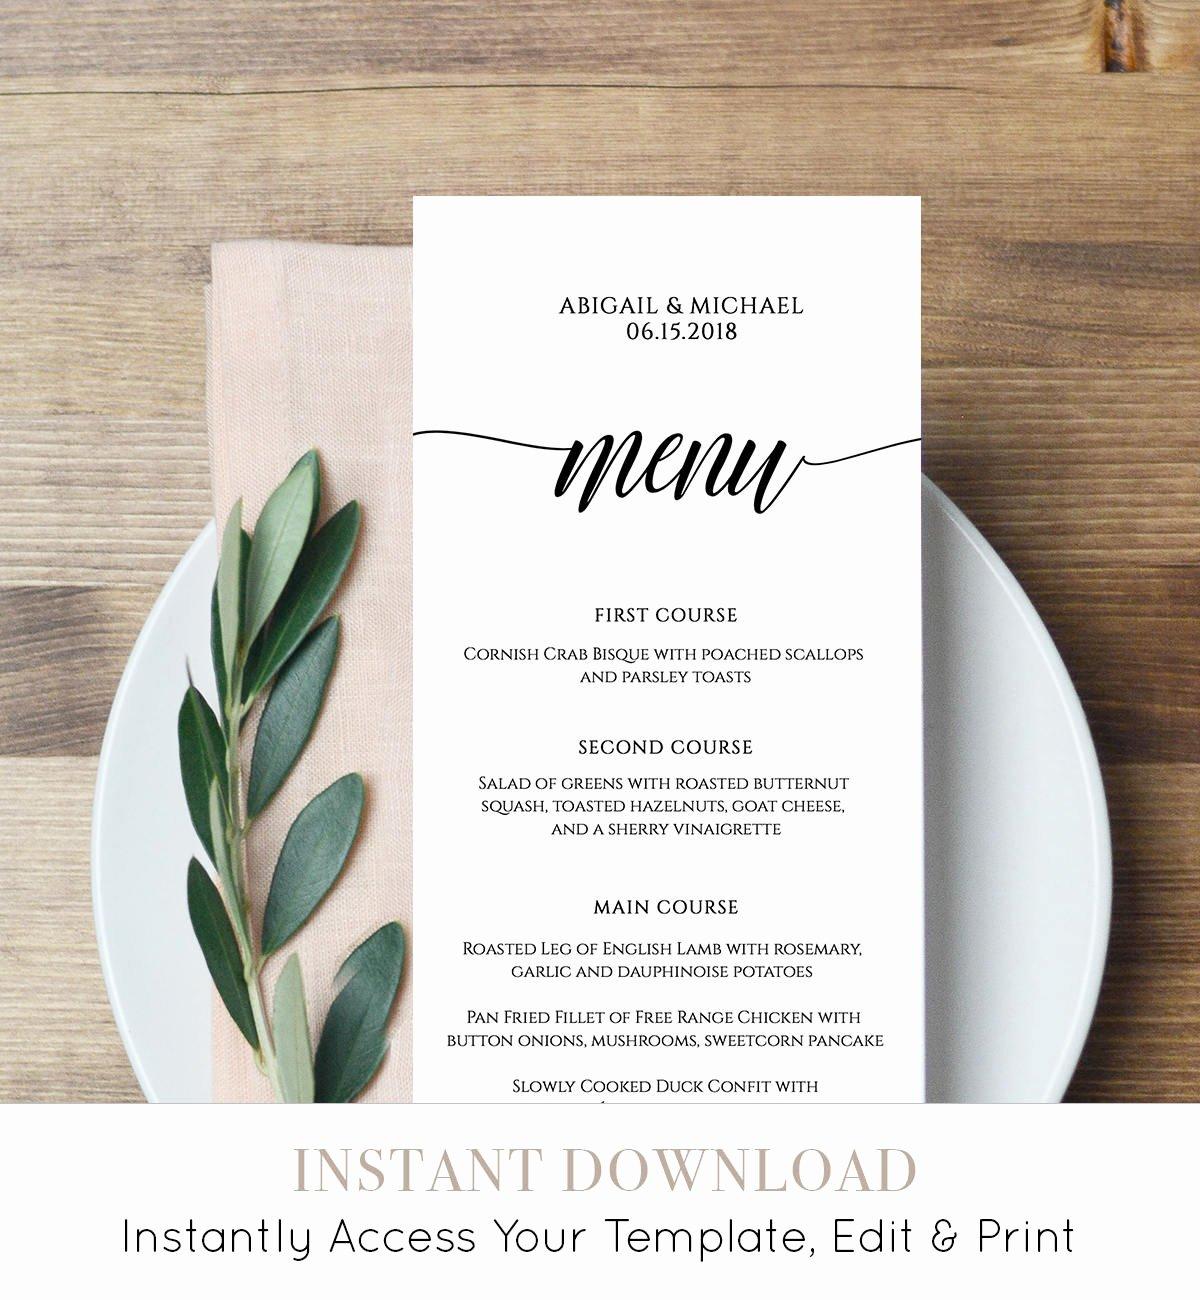 Wedding Menu Card Template Luxury Menu Card Template Rustic Dinner Menu Wedding Menu Card